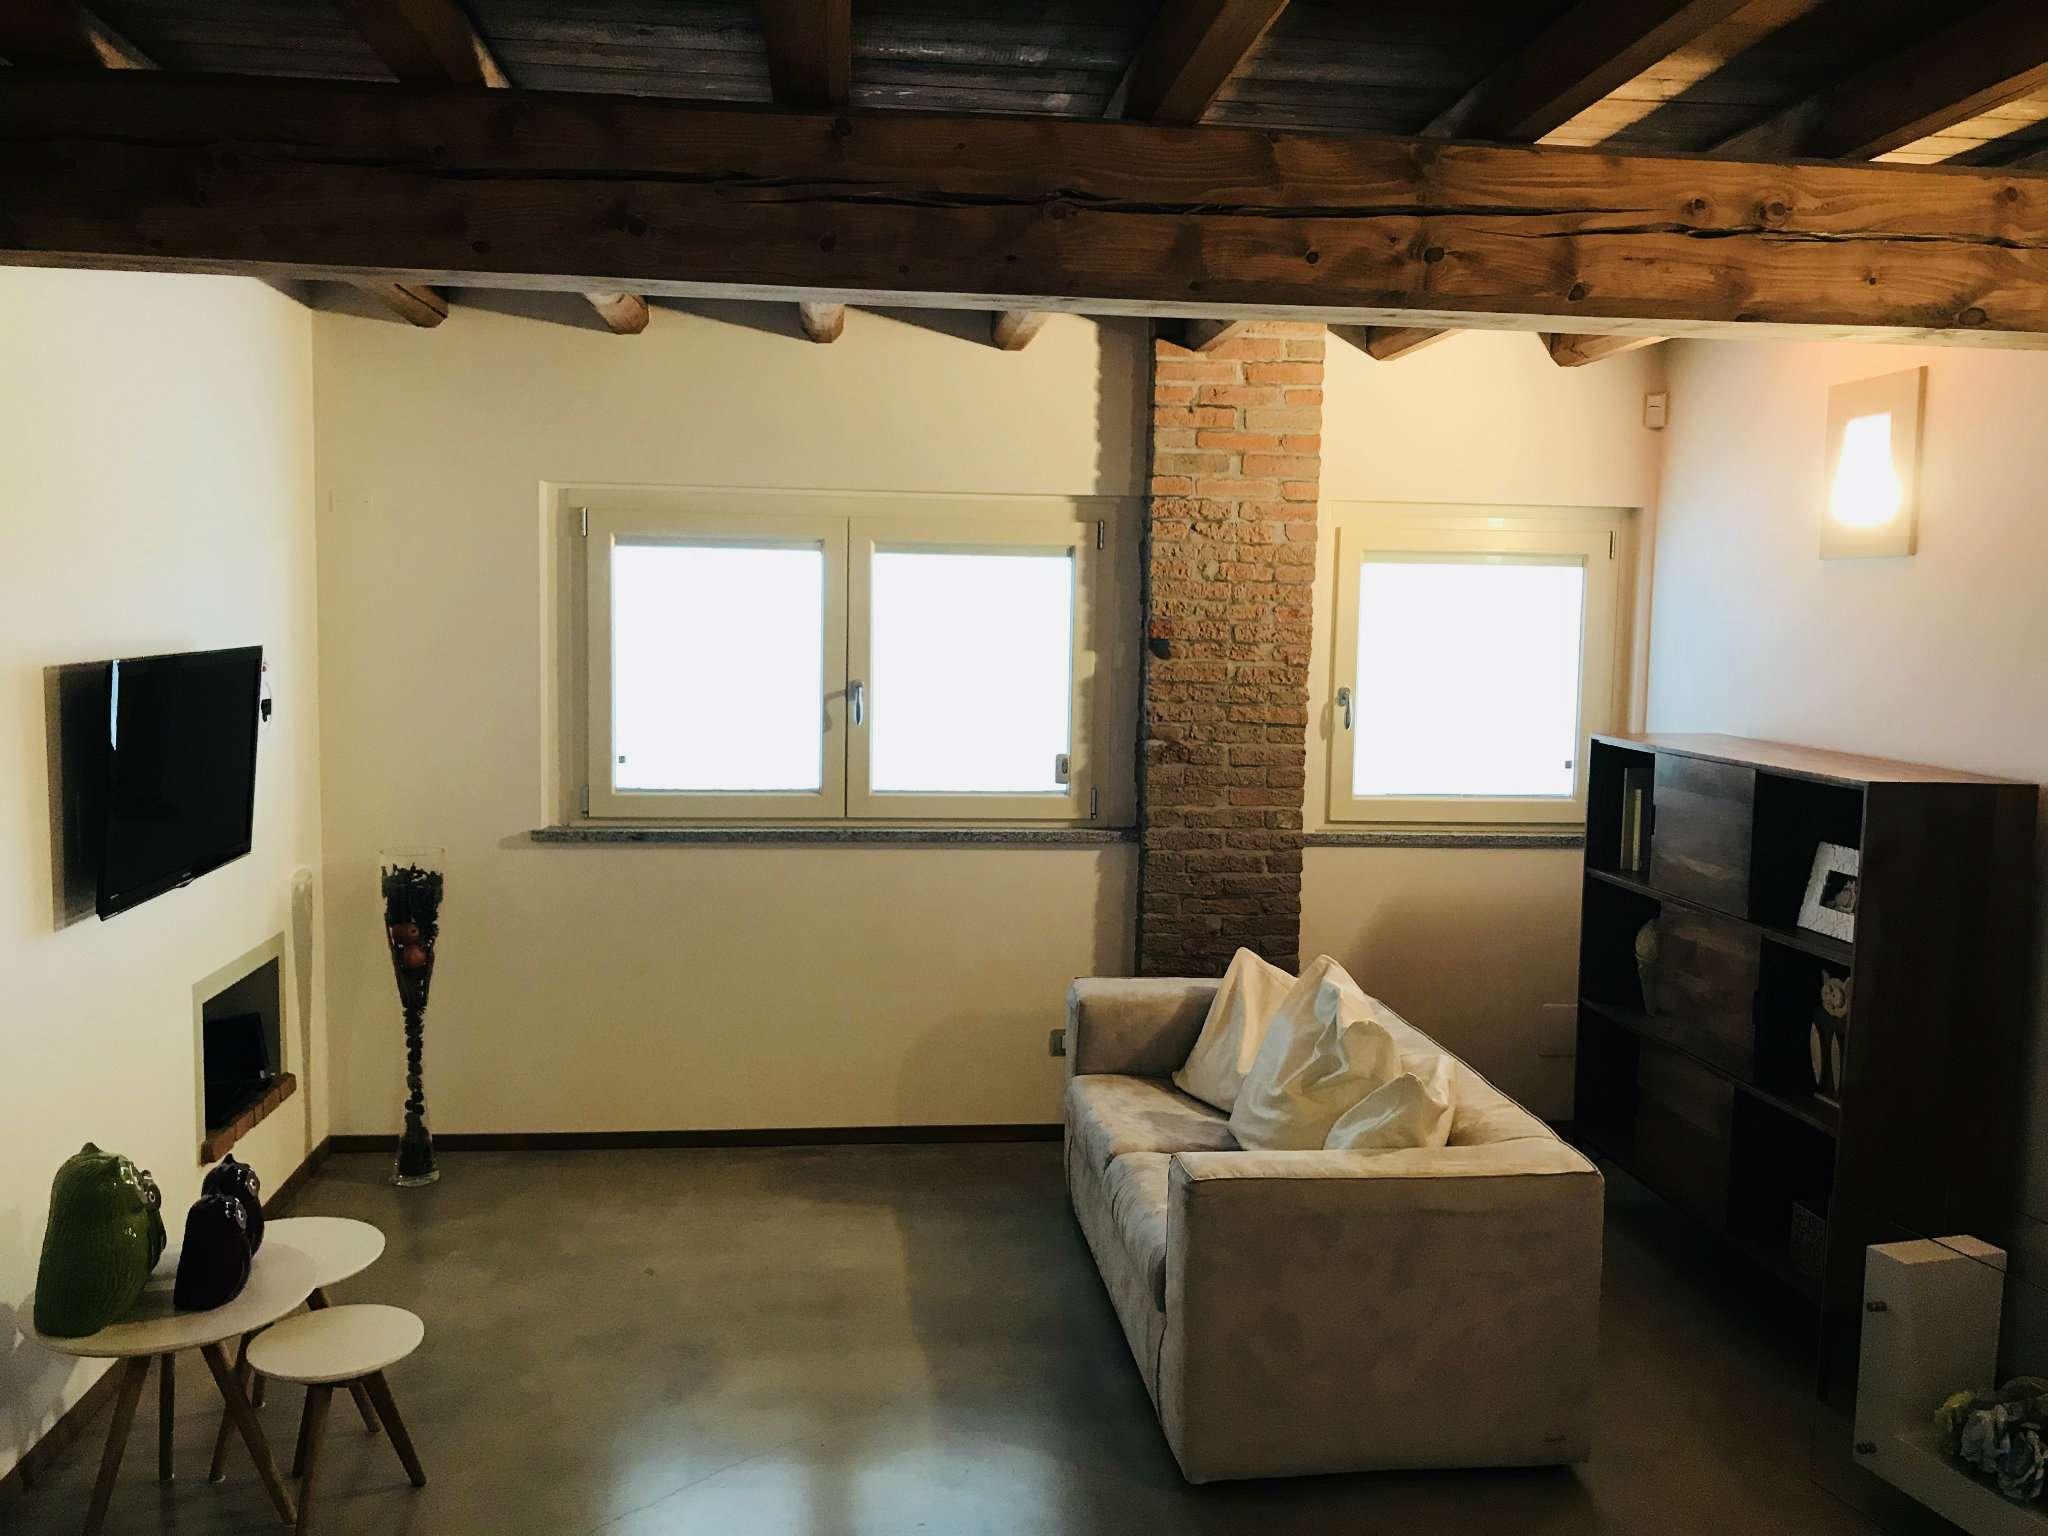 Casa indipendente quadrilocale in vendita a Calendasco (PC)